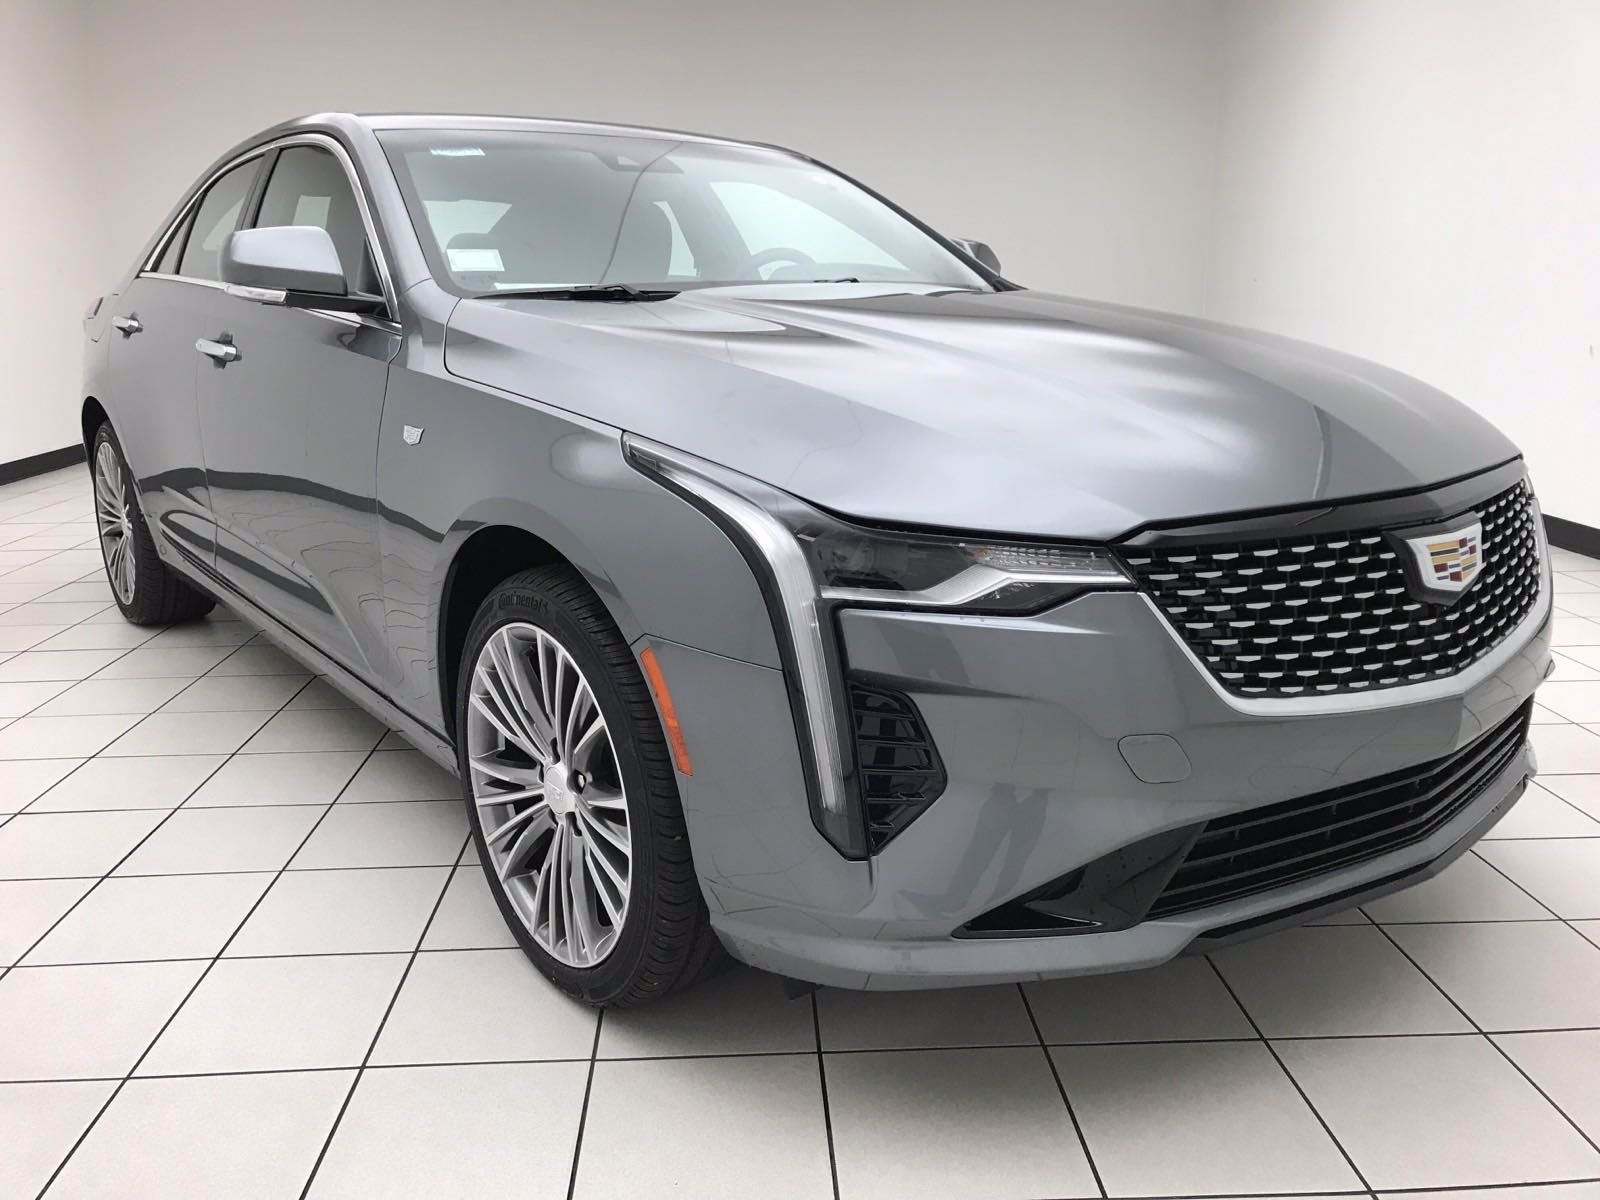 2021 Cadillac CT4 Sheboygan WI